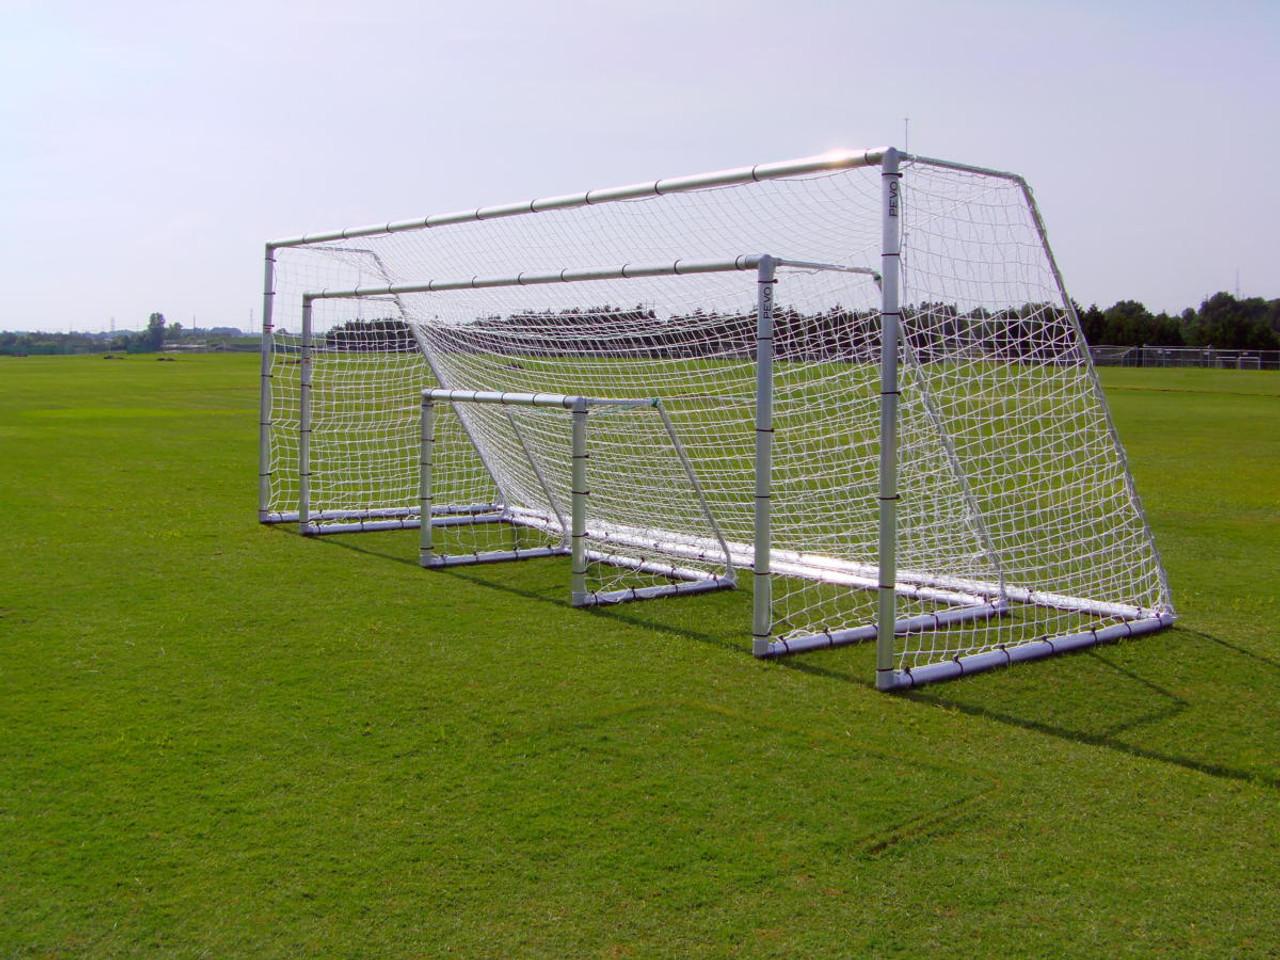 Pevo Soccer Goals 4.5 x 9'_4